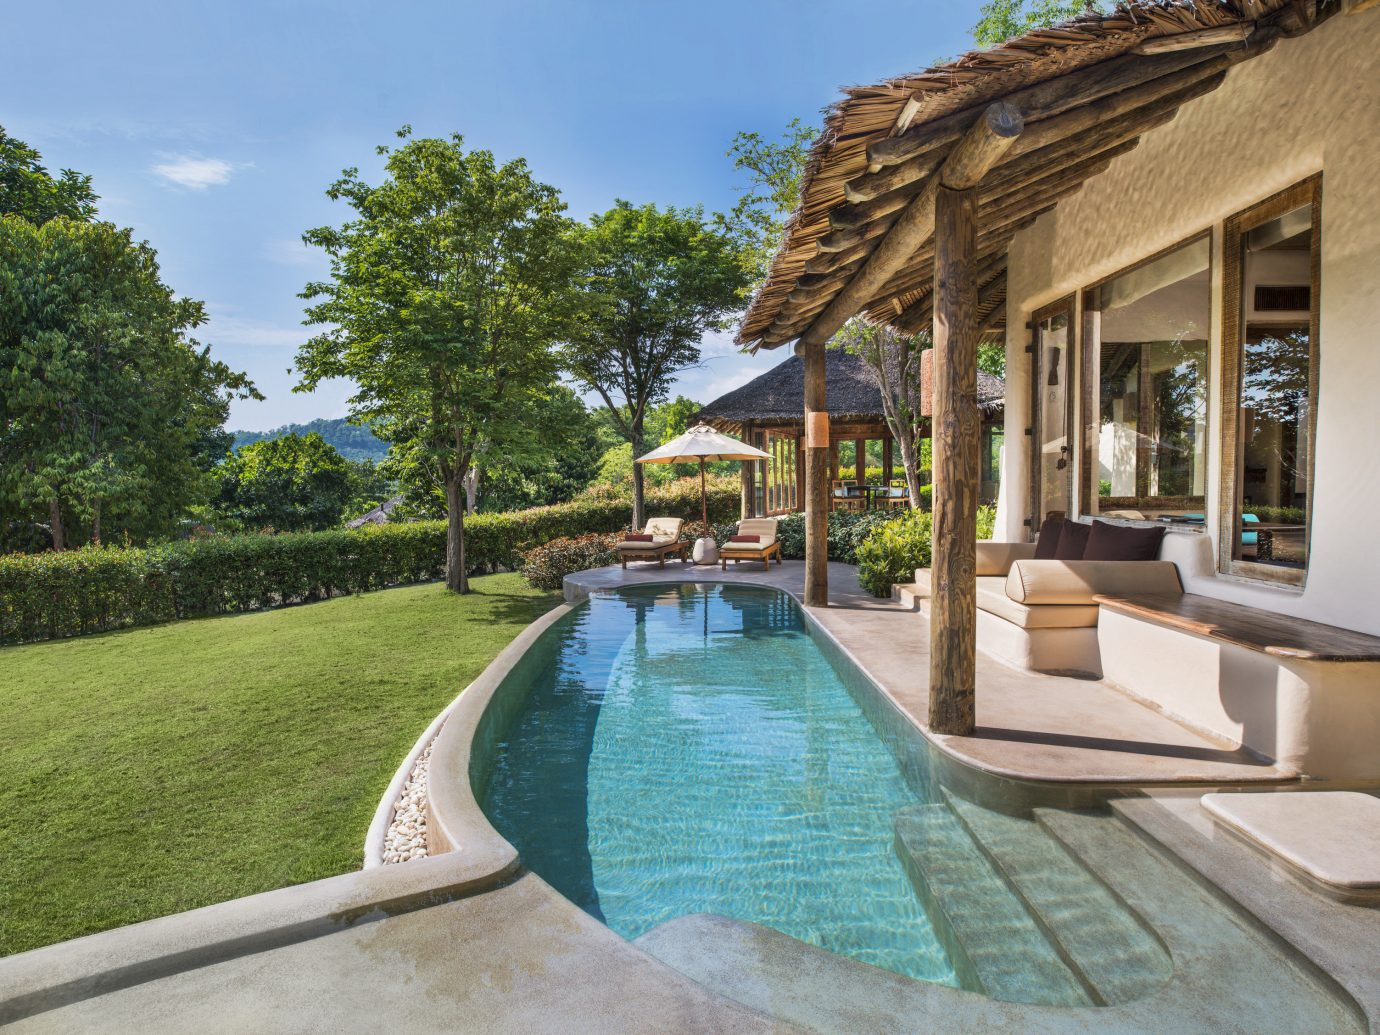 Beach Hotels Phuket Thailand property swimming pool estate Resort real estate Villa home leisure house hacienda backyard cottage amenity